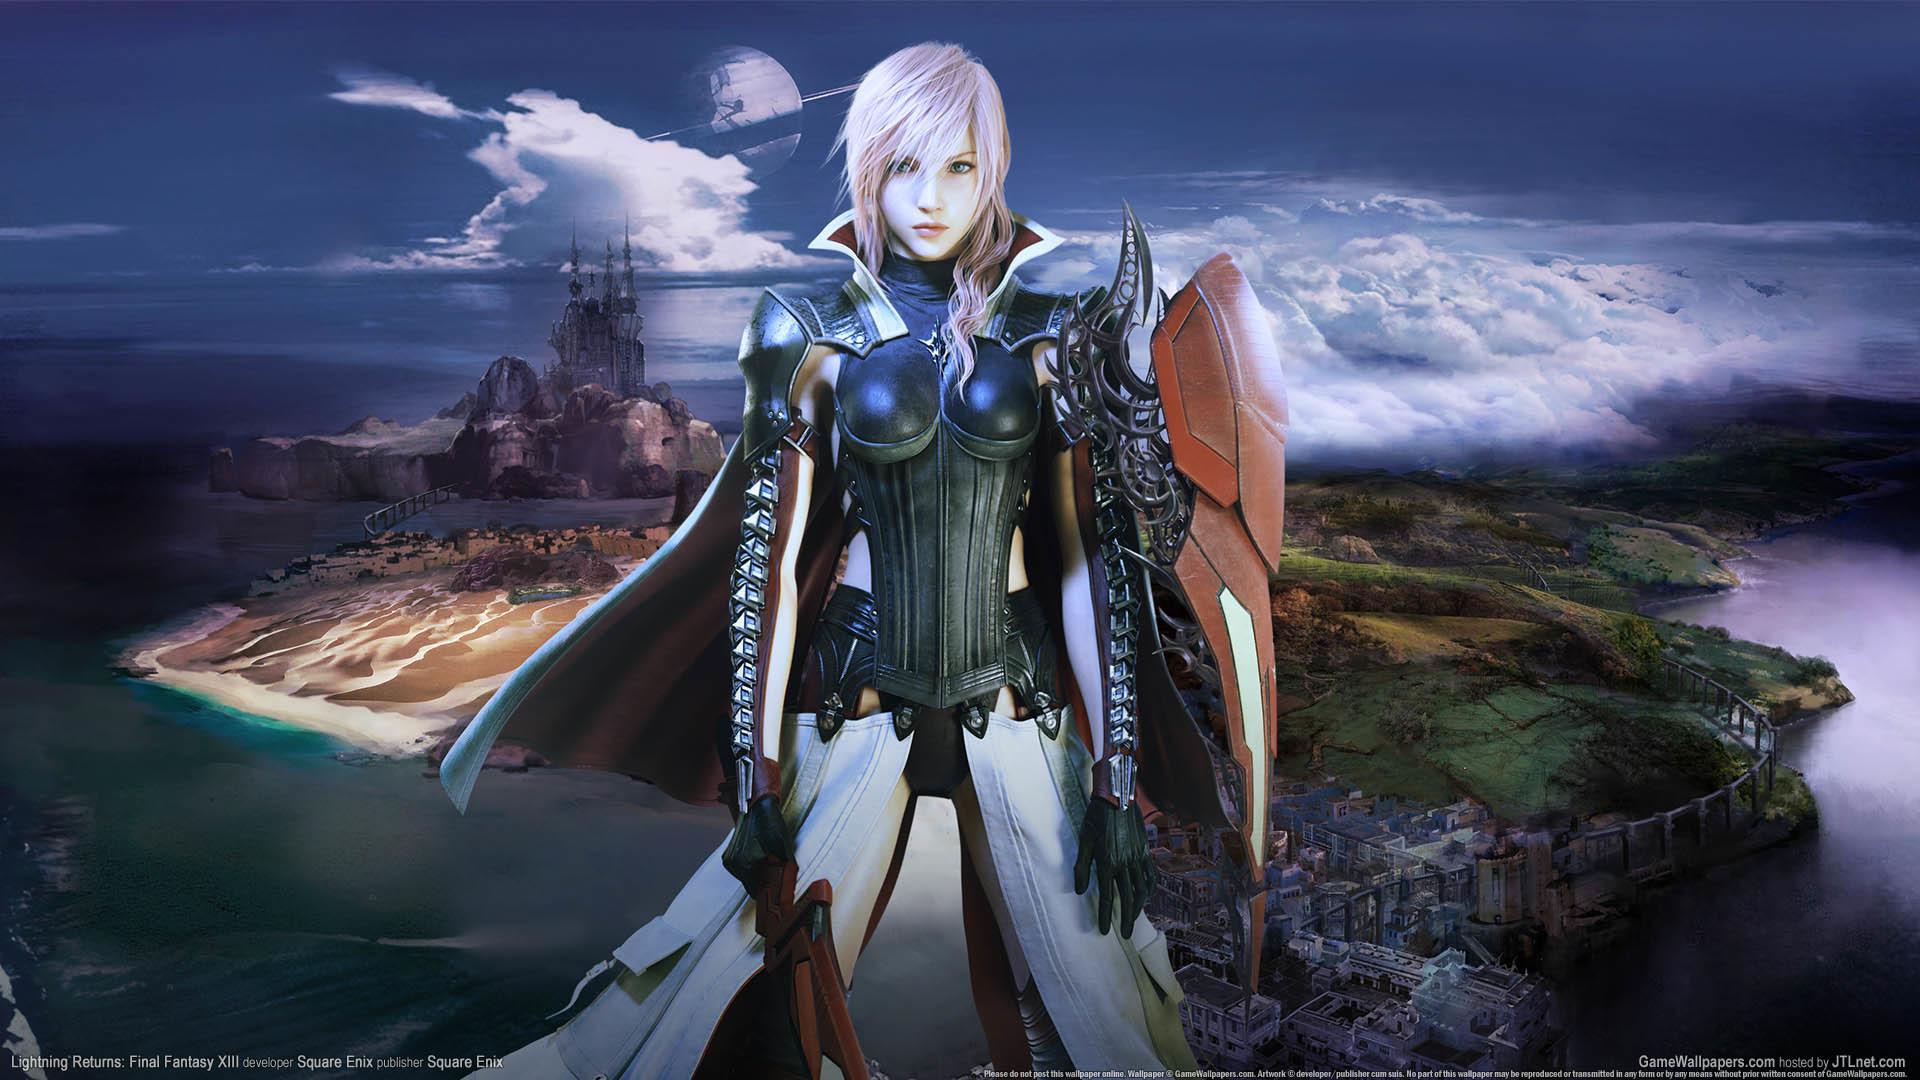 … Lightning Returns: Final Fantasy XIII wallpaper or background 01